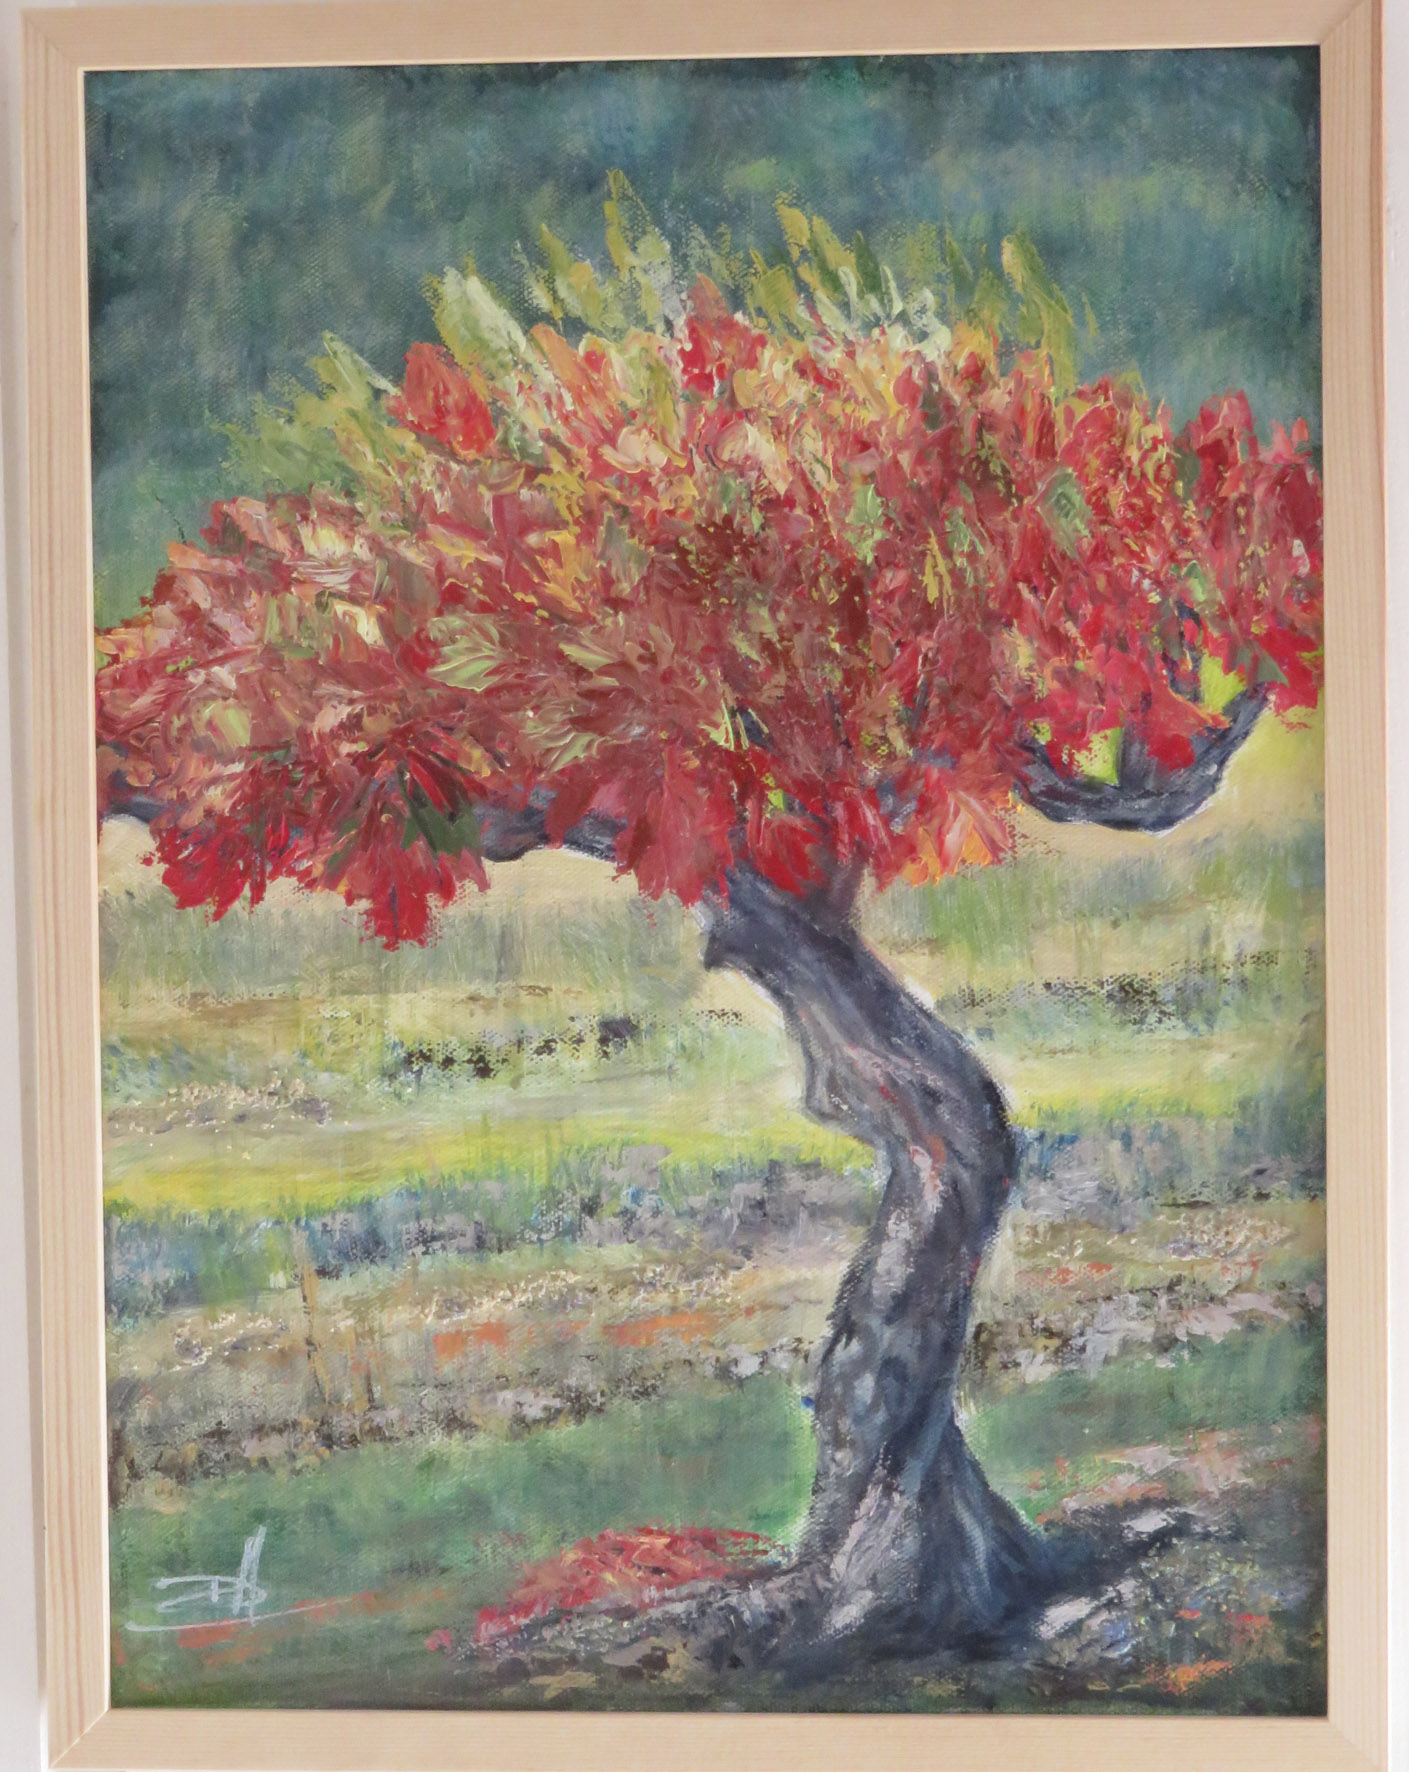 vigne cevenole Nov19